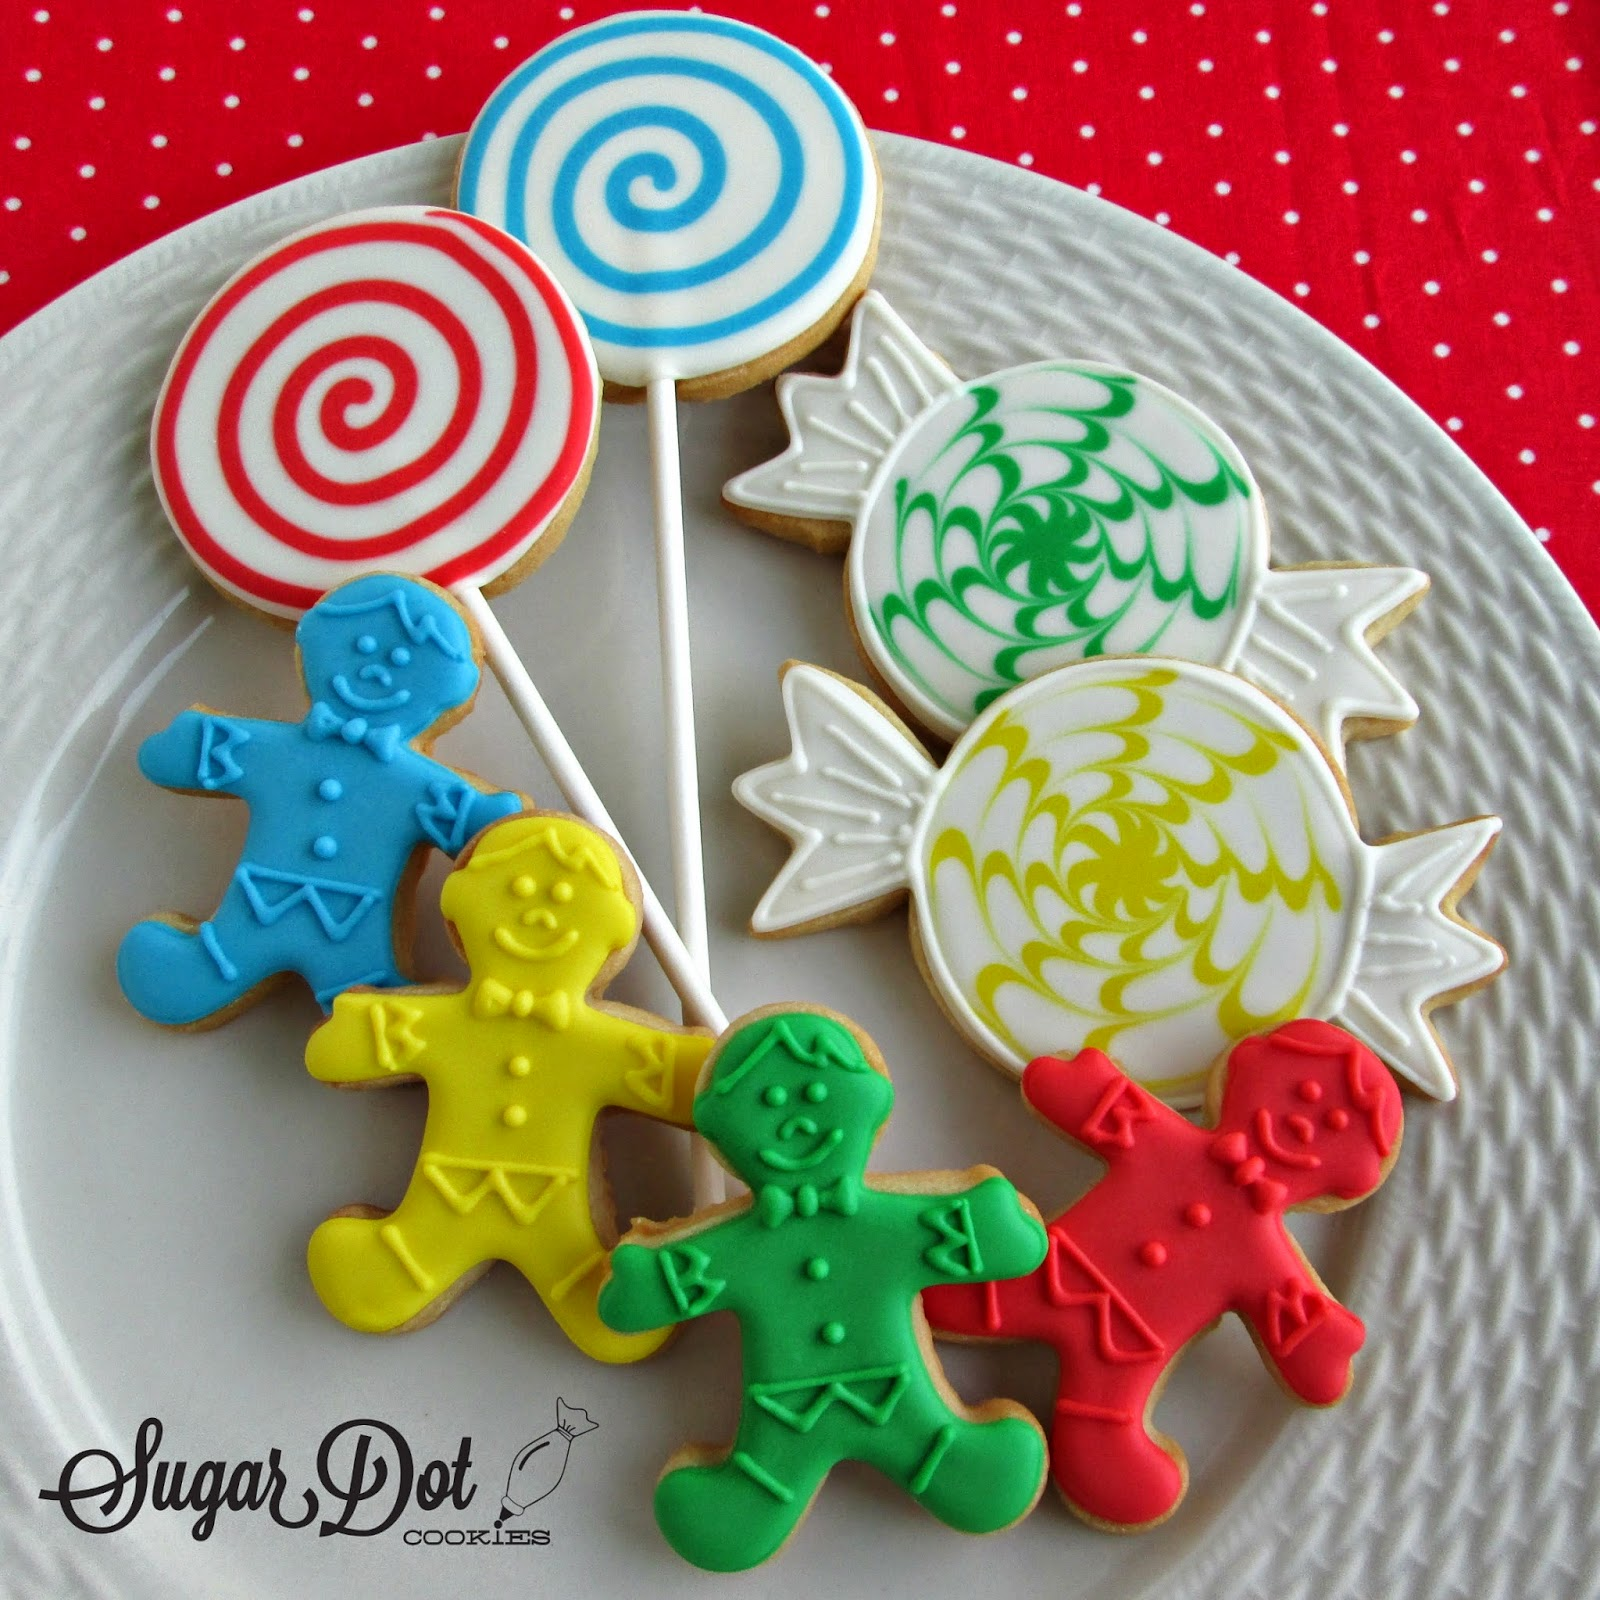 sugar dot cookies candyland cookies